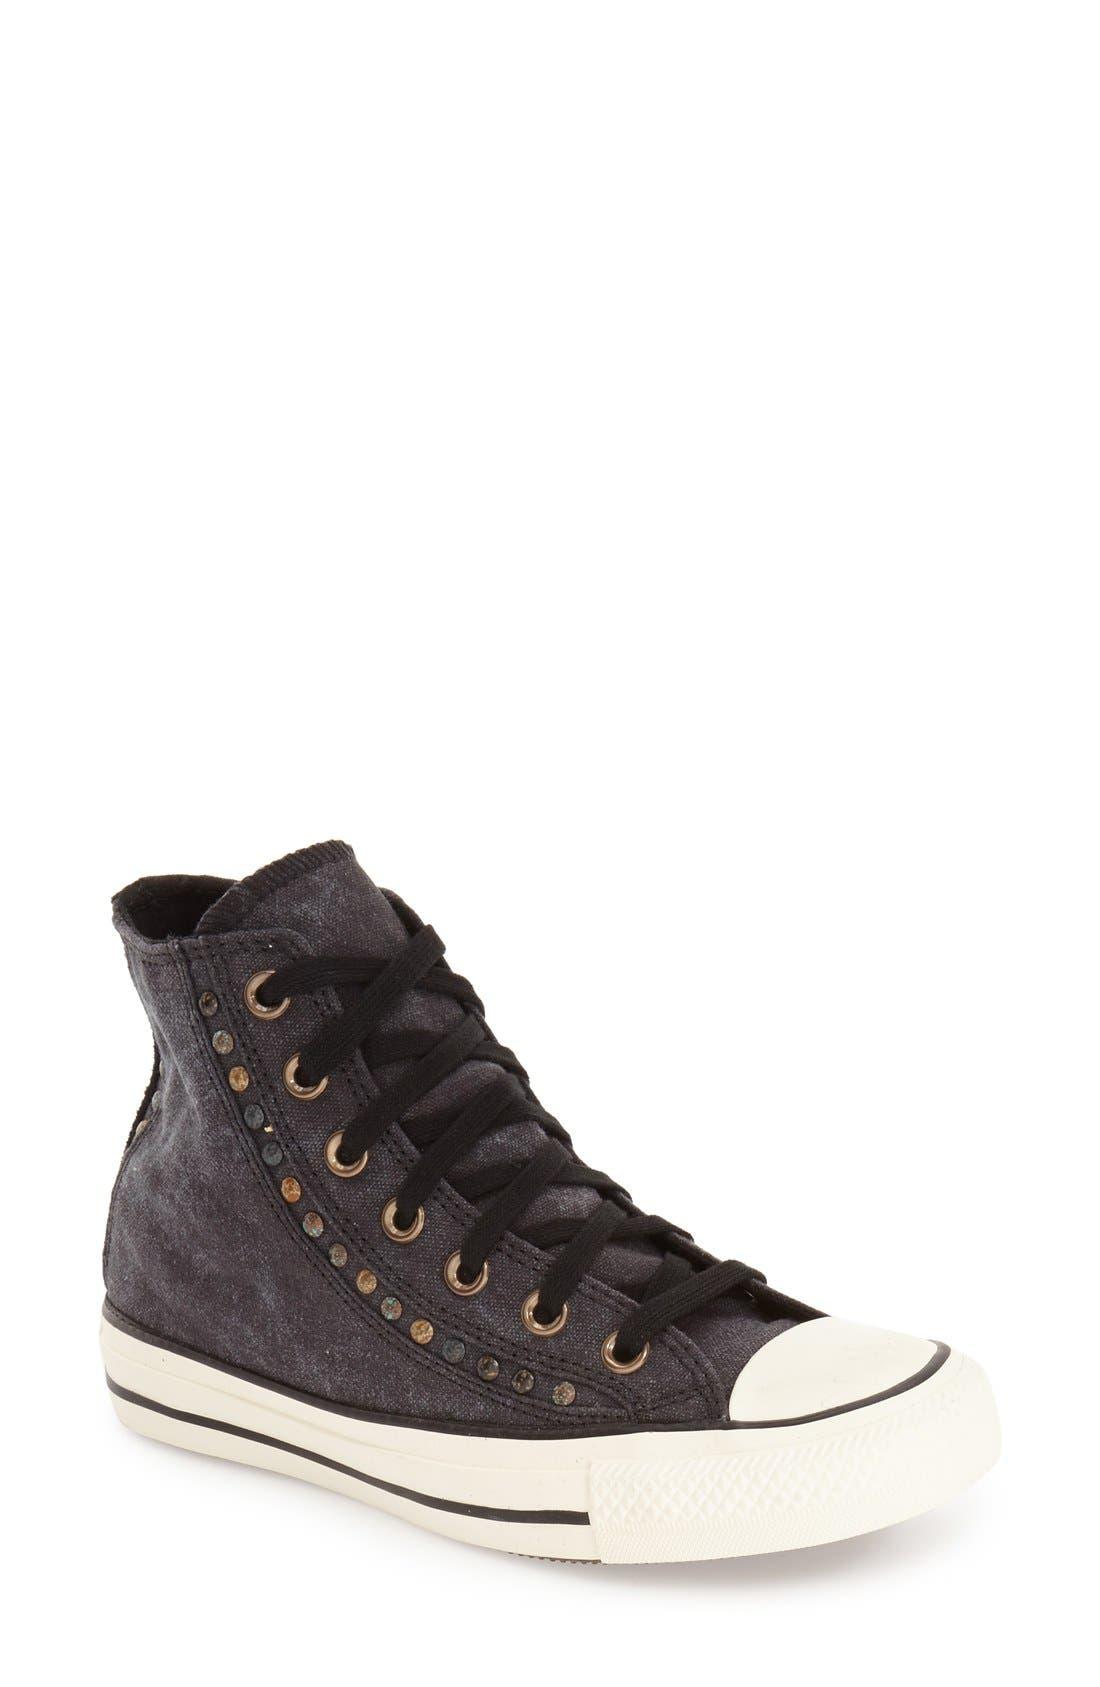 Alternate Image 1 Selected - Converse Chuck Taylor® All Star® 'Eyerow' Studded High Top Sneaker (Women)